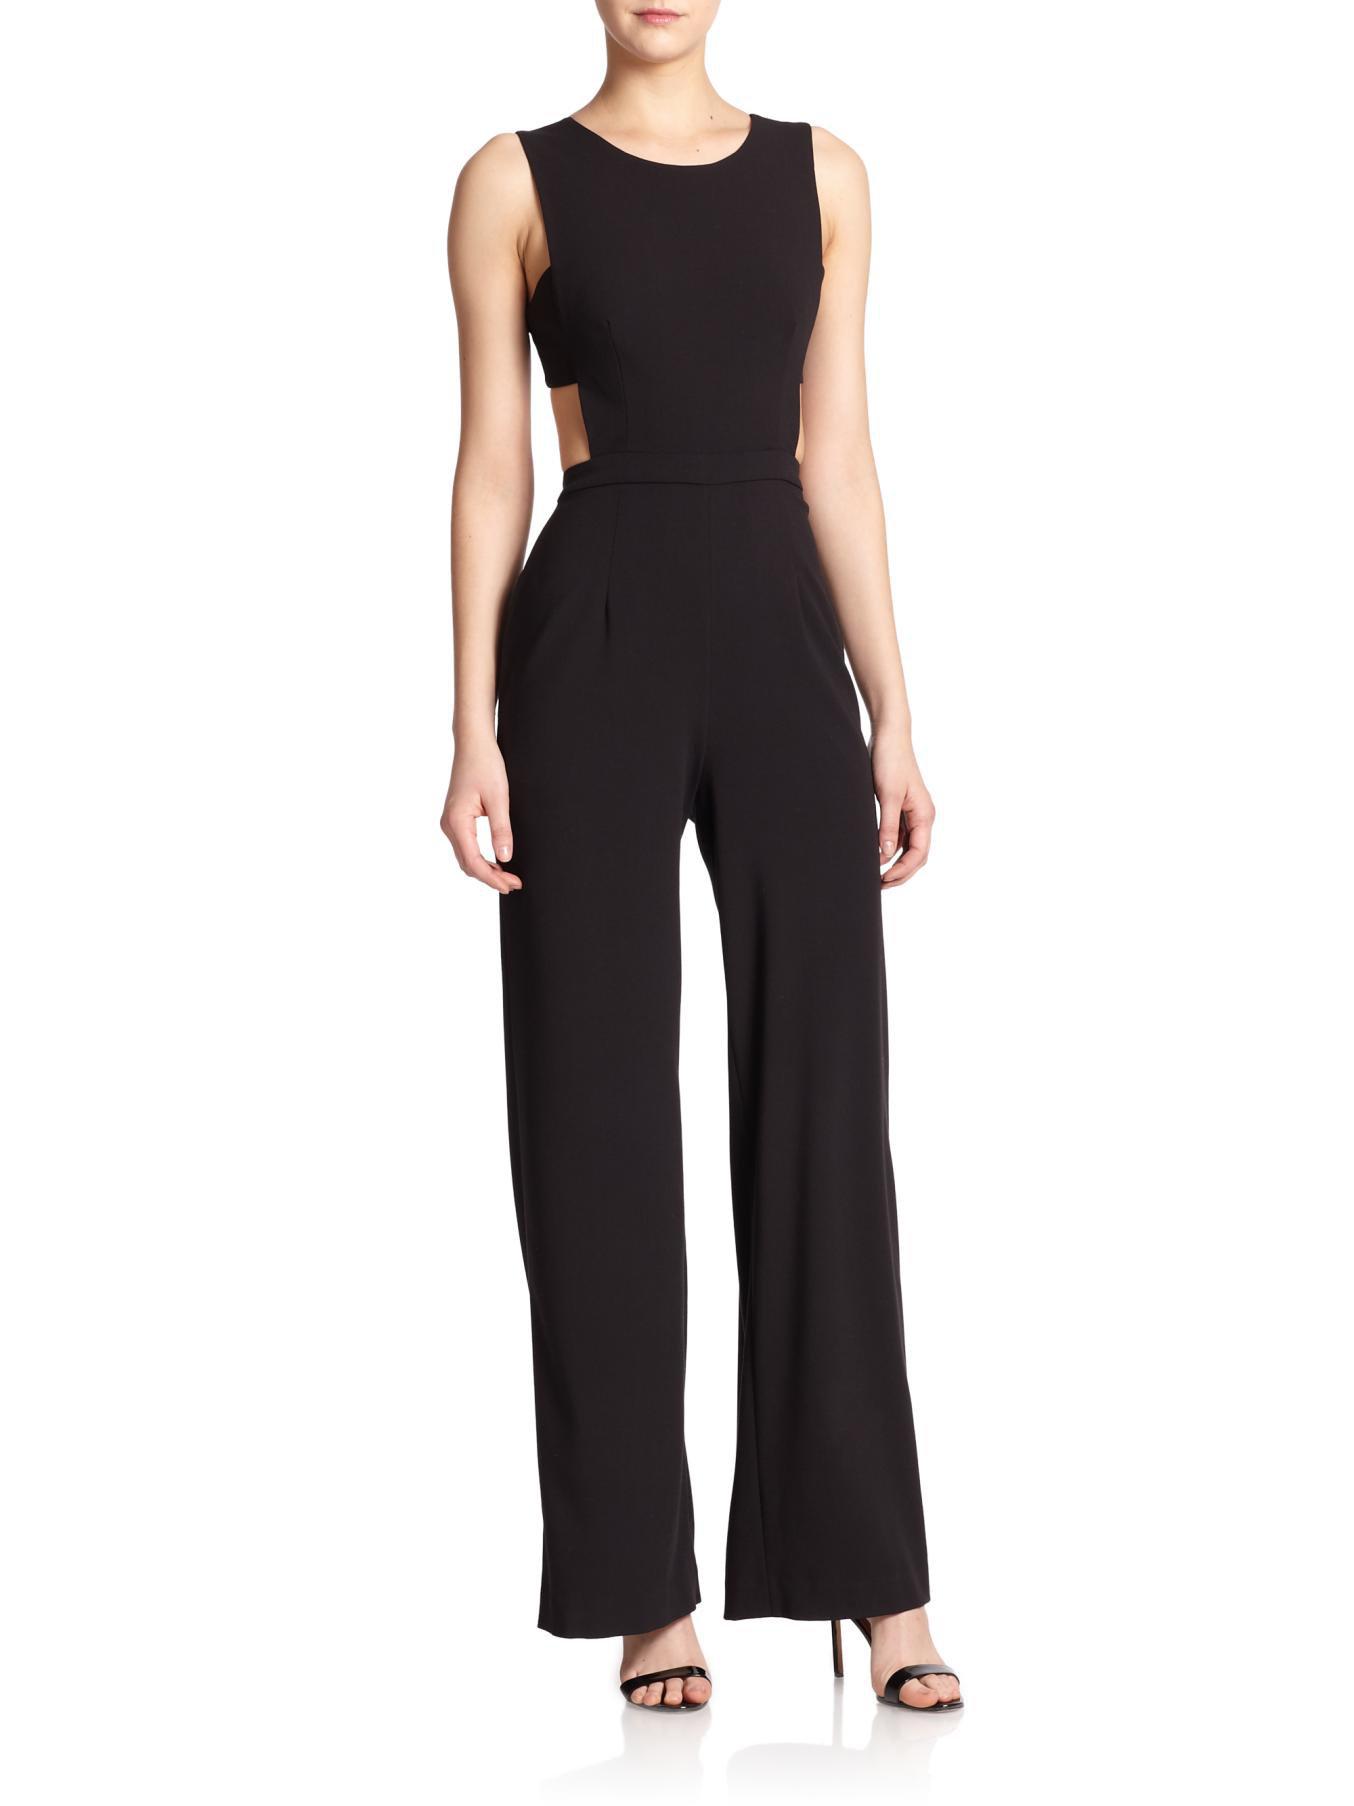 941ee699228 Lyst - BCBGMAXAZRIA Rosanna Cutout Jumpsuit in Black